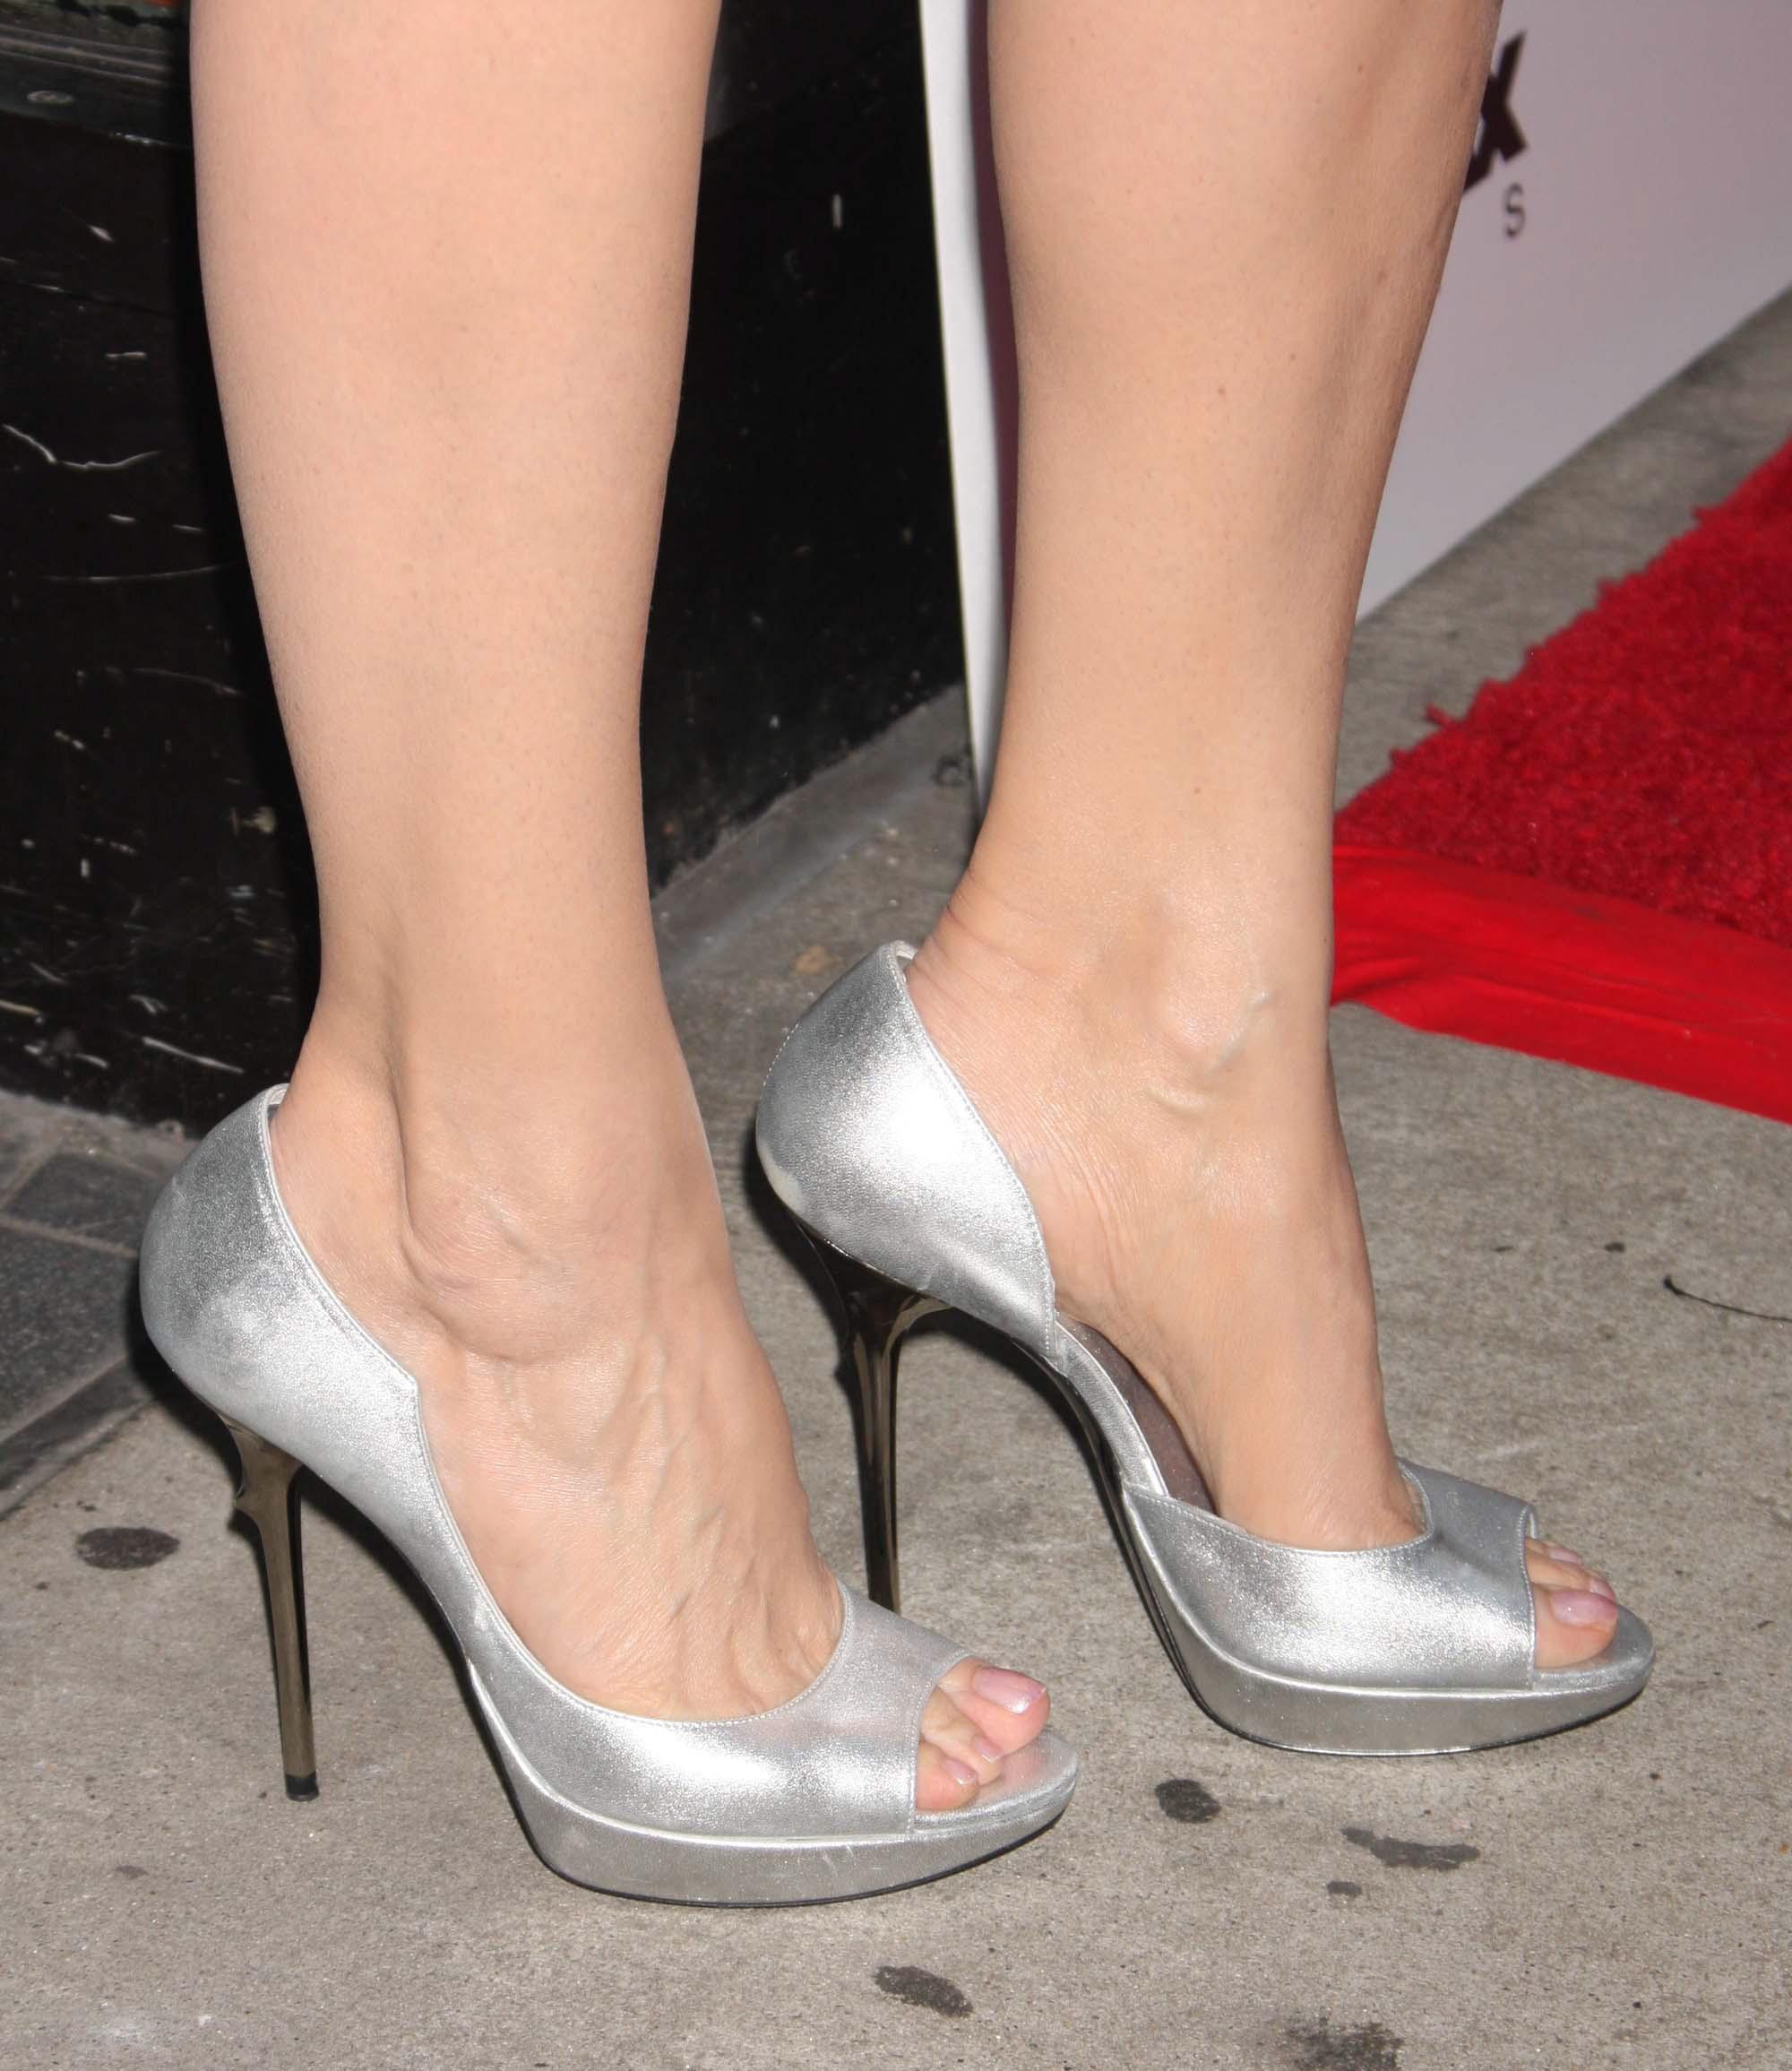 Michelle Pfeiffer S Feet